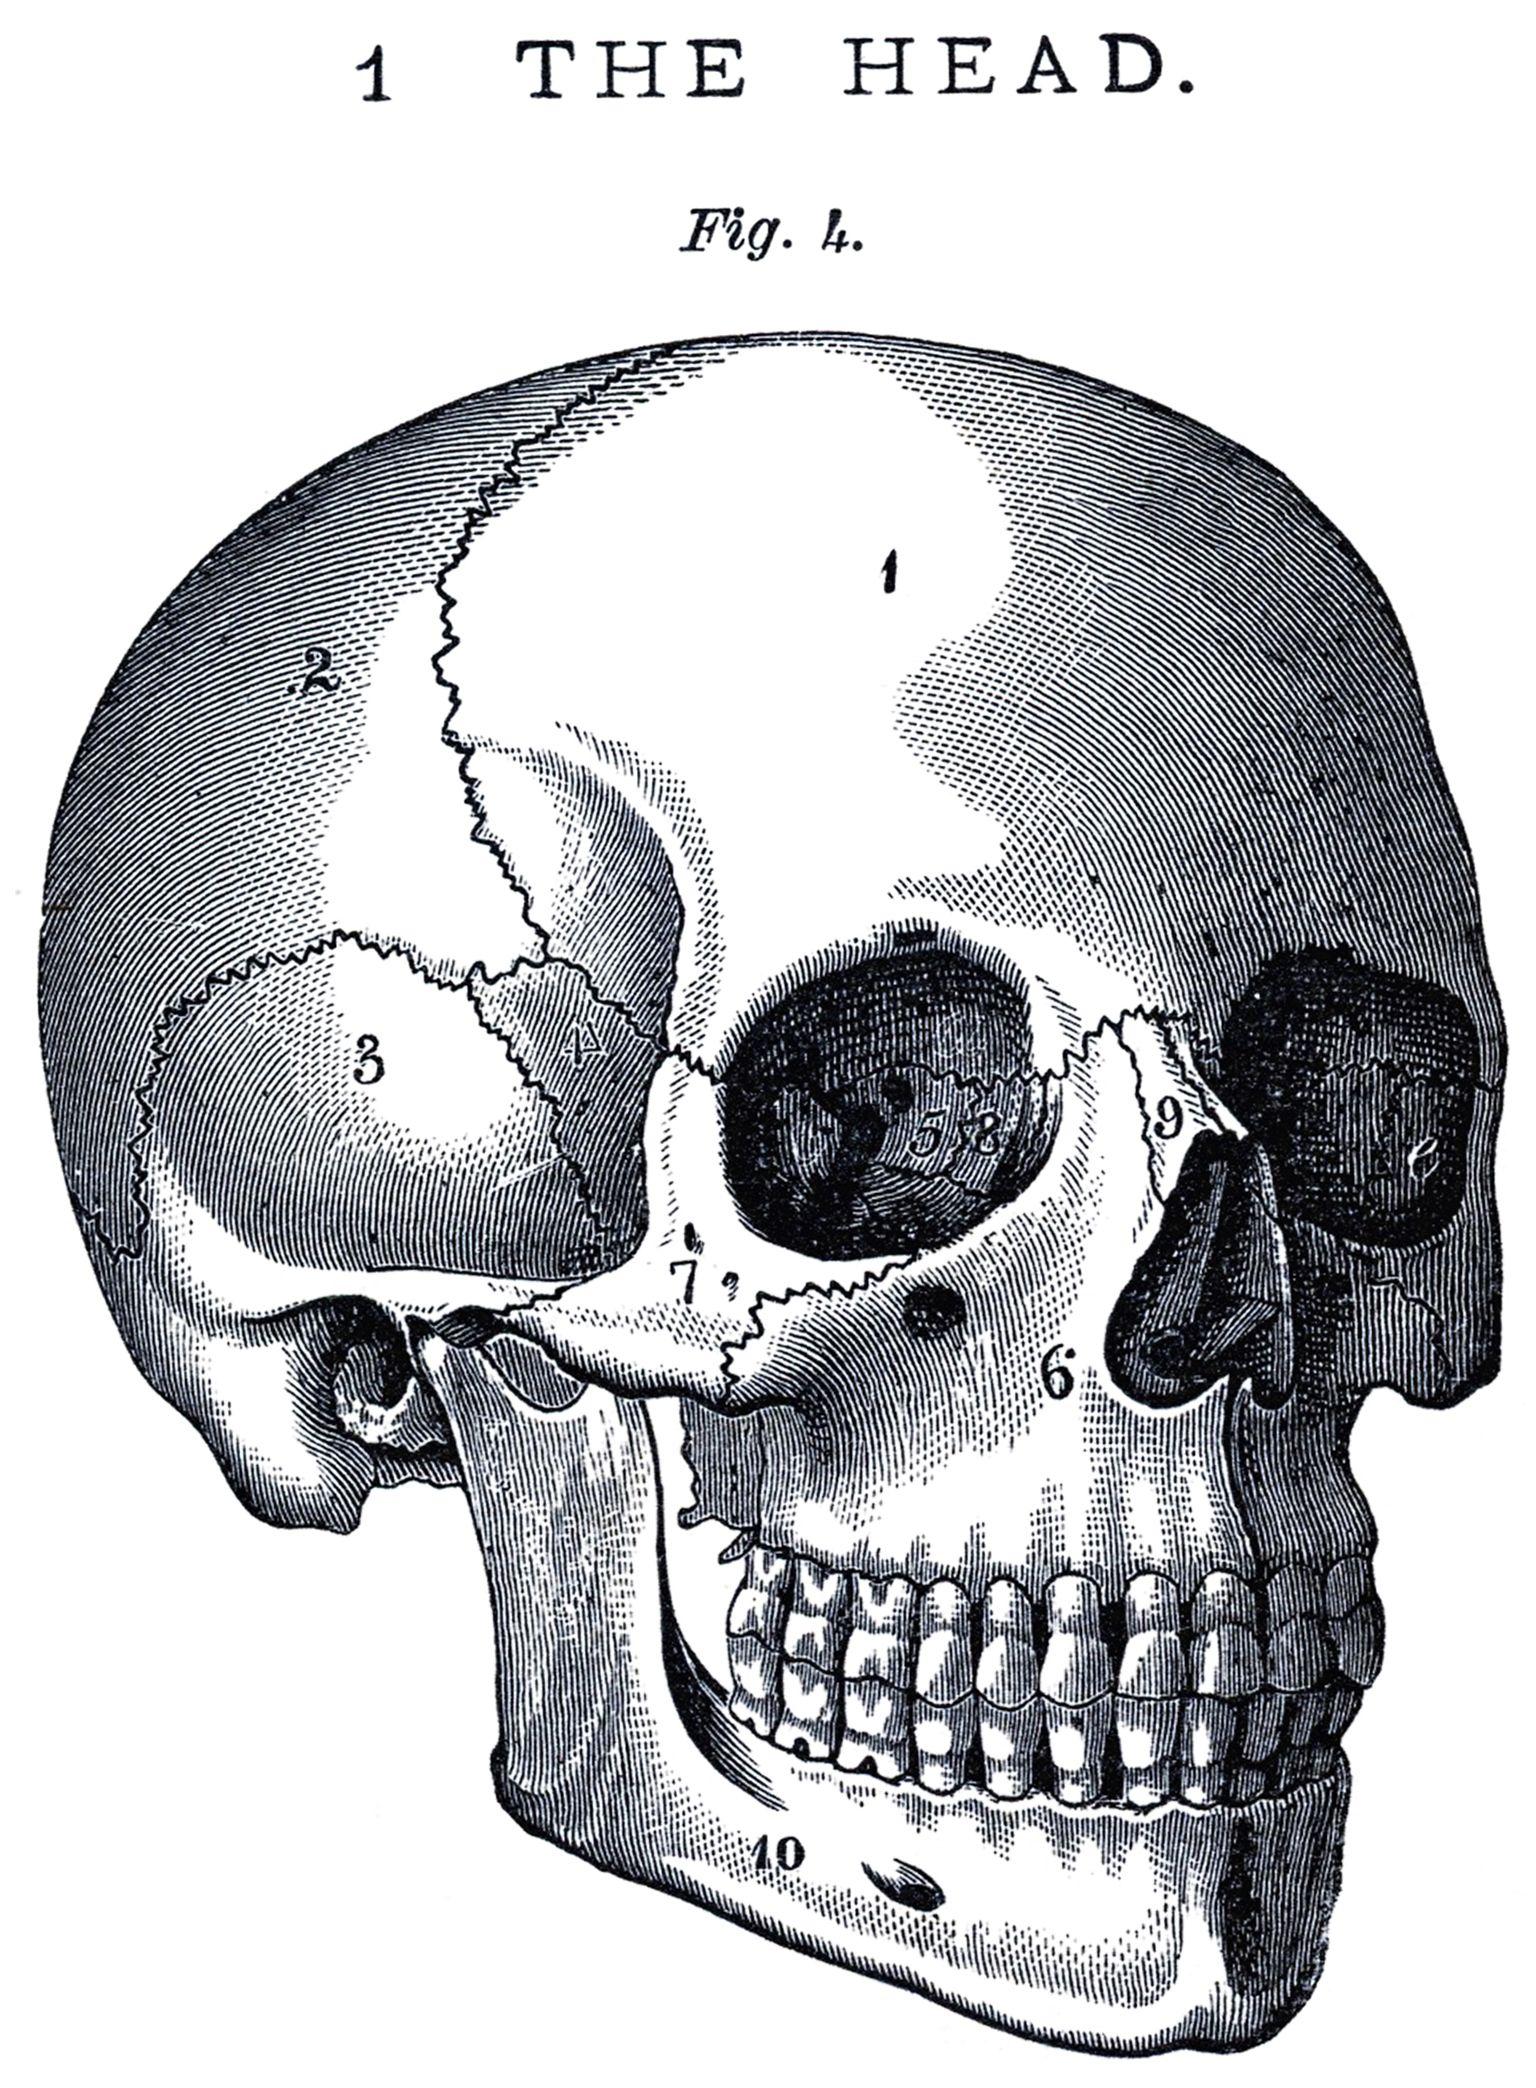 6 Skull Images Vintage Anatomy Clip Art Bones Morgue Files